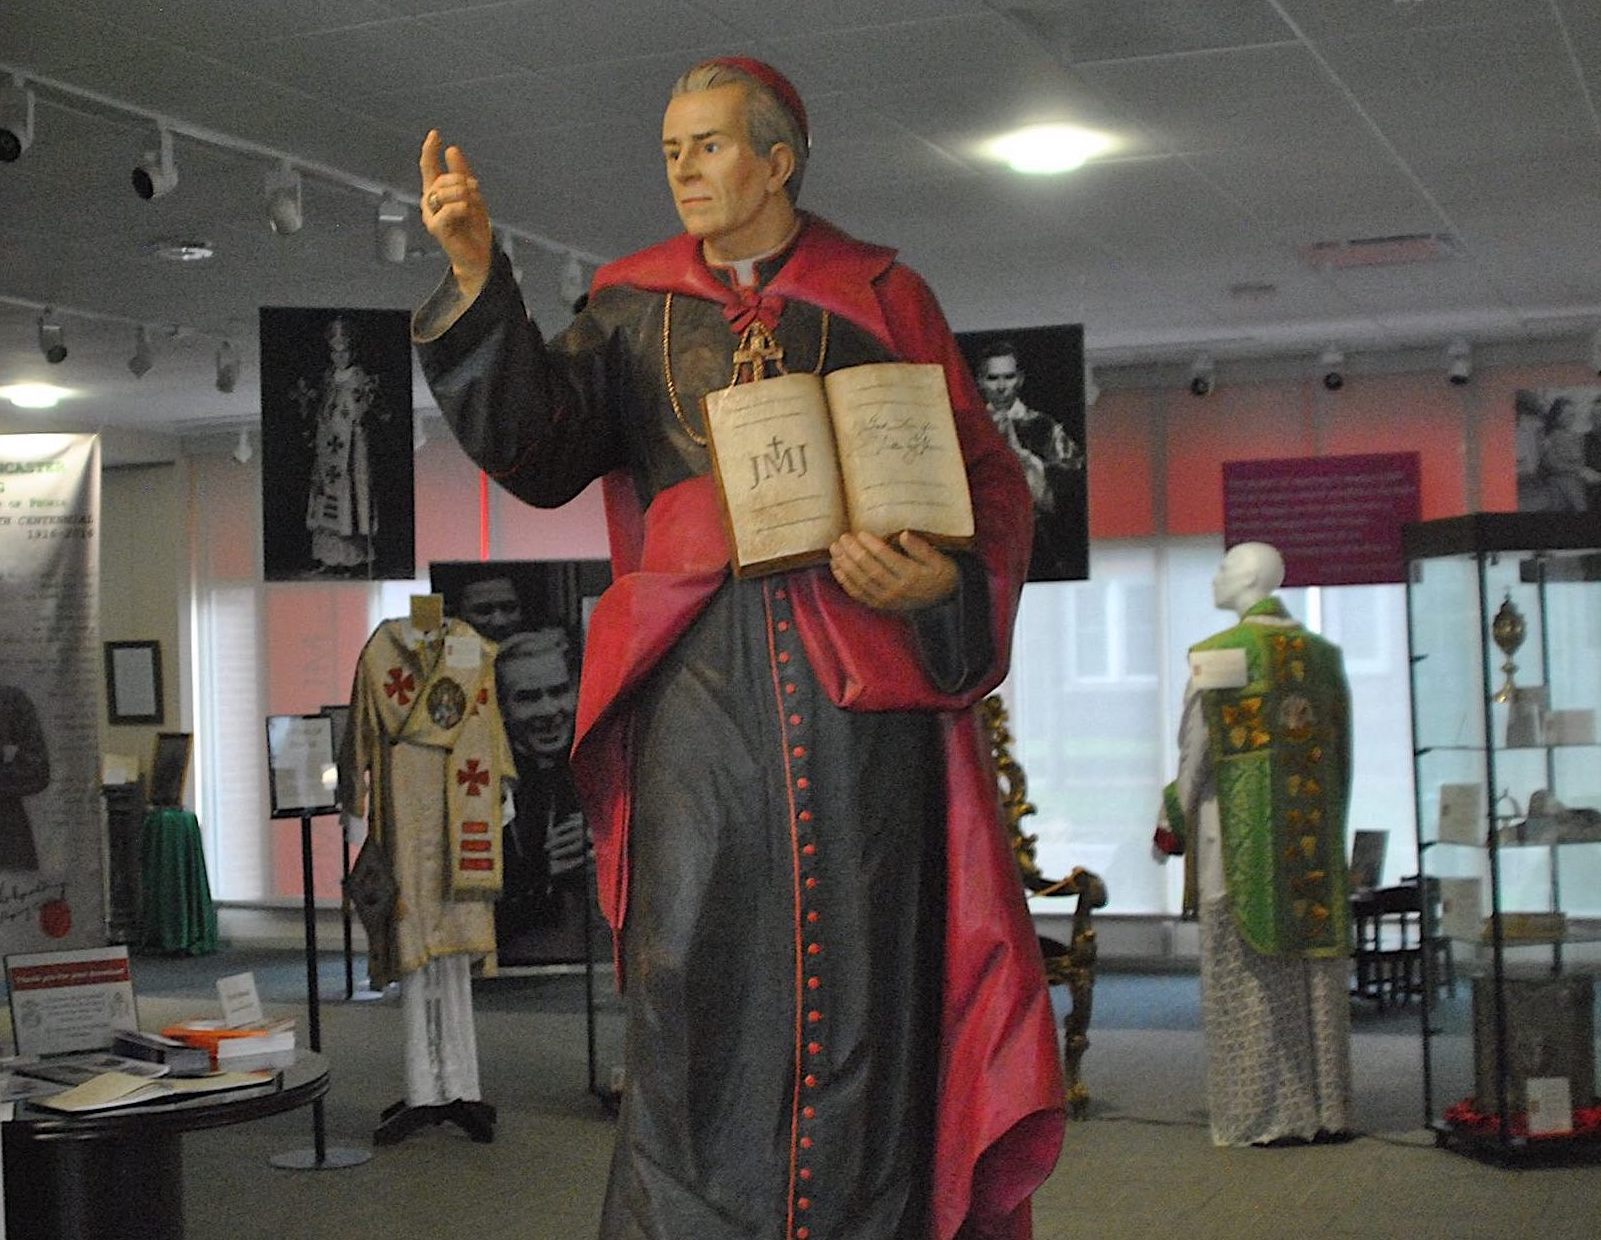 Venerable Archbishop Fulton J. Sheen hand-carved wood statue